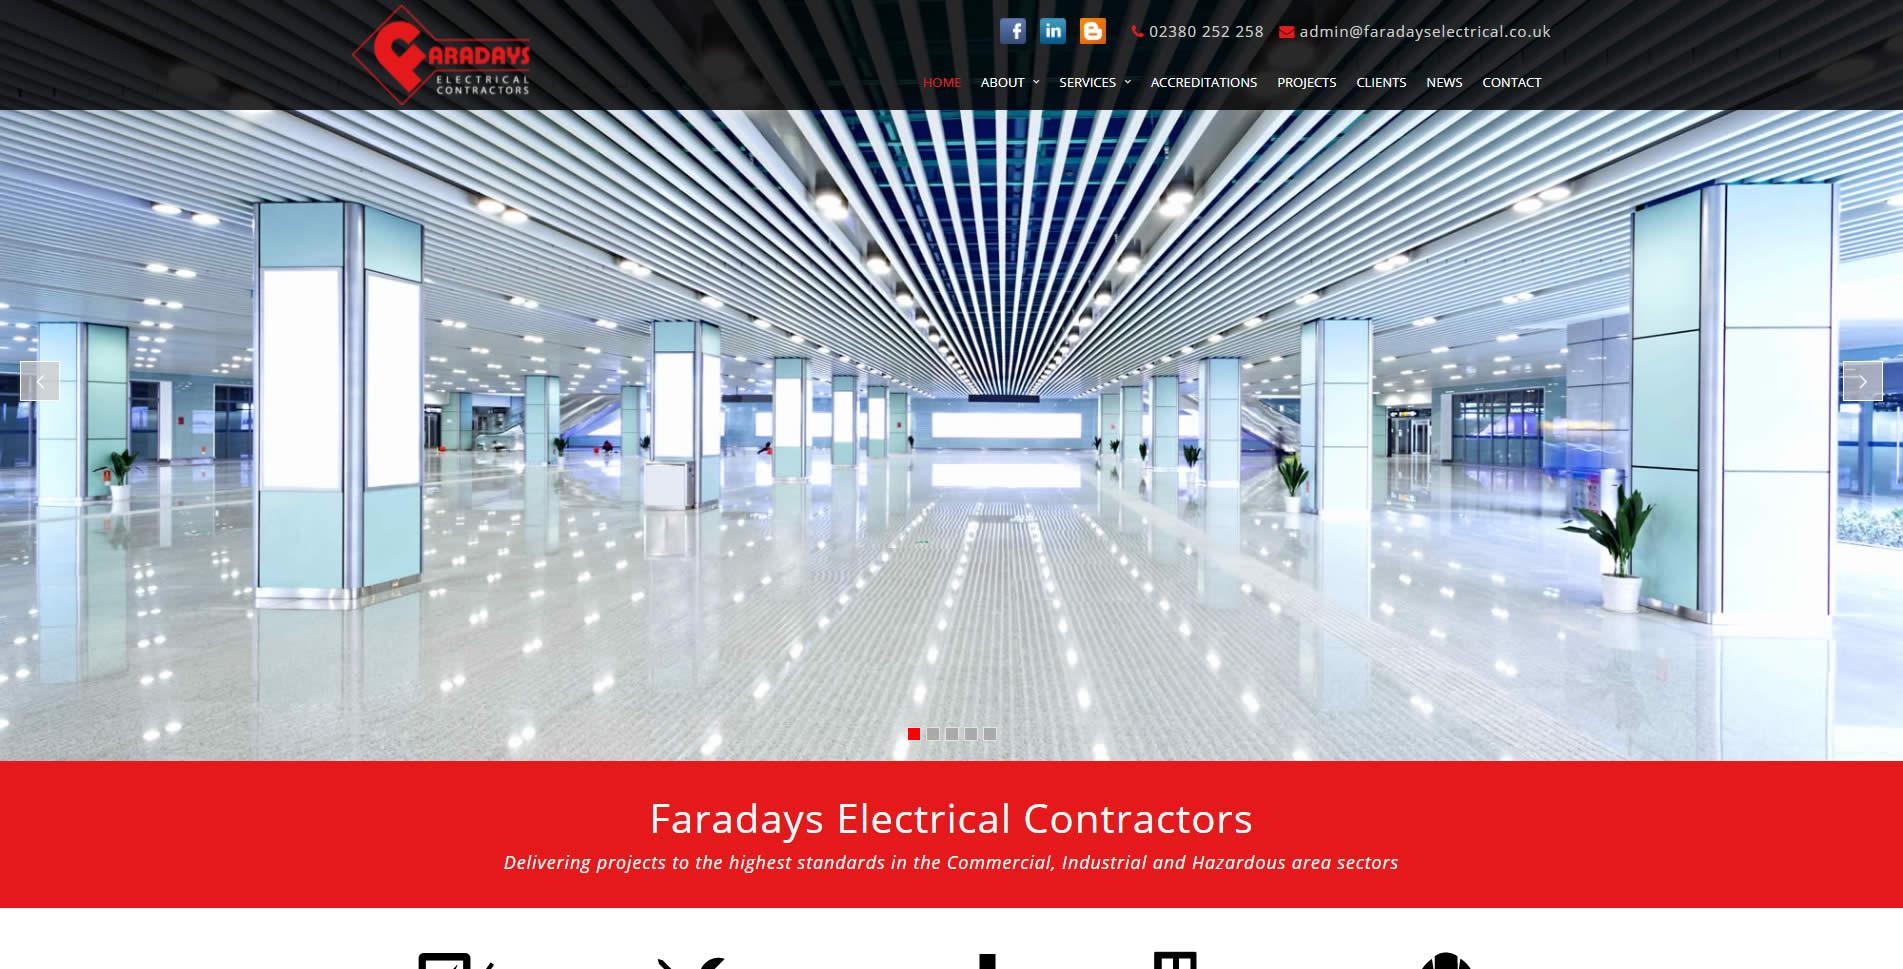 Faradays Electrical